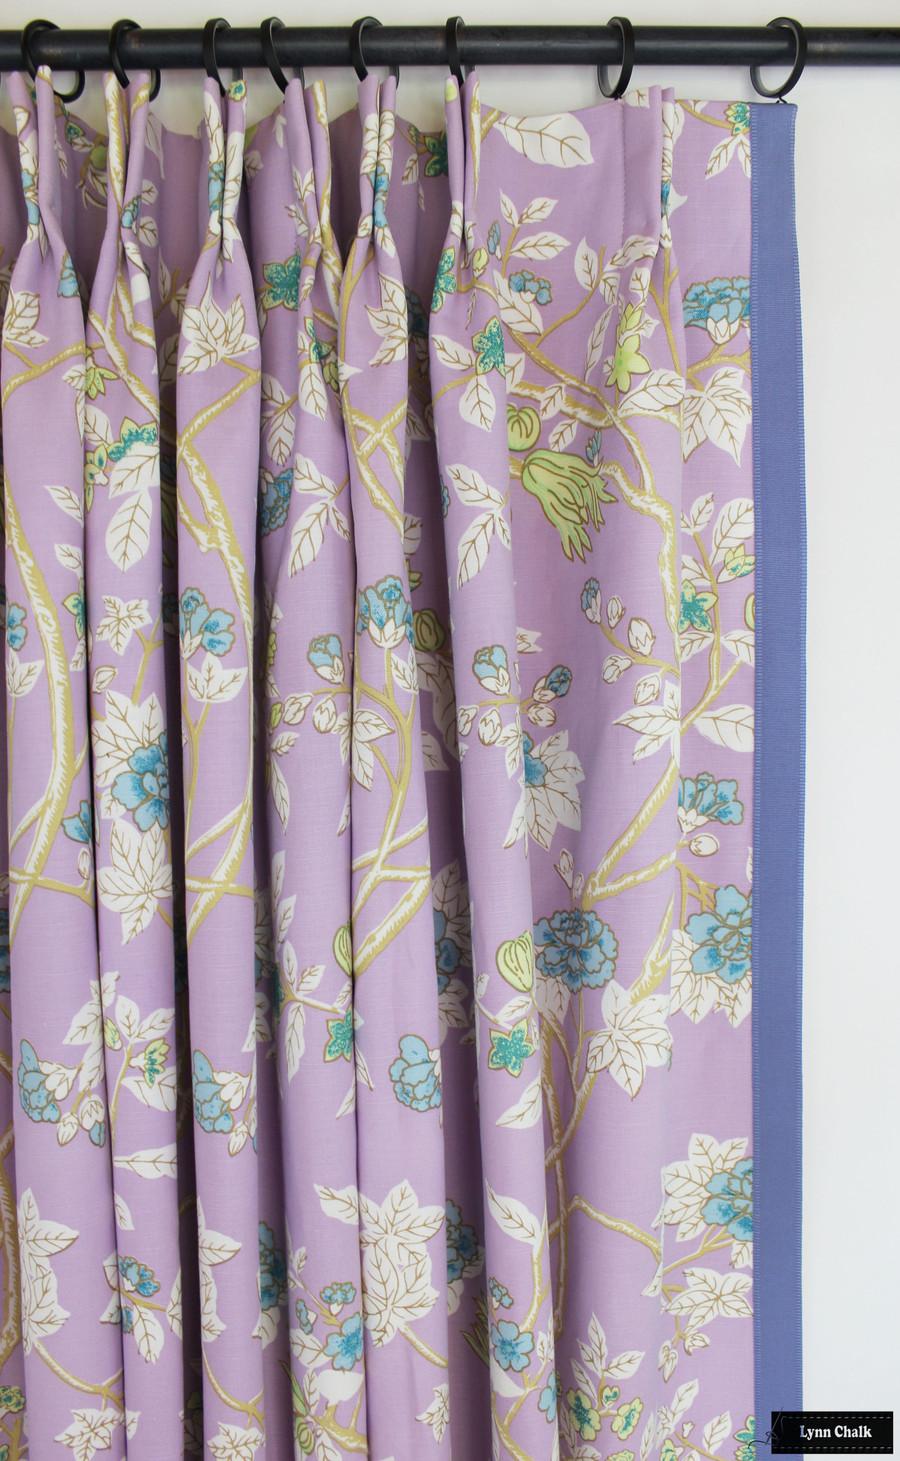 Quadrille Happy Garden Lavender on White 306064F with Samuel & Sons Cambridge Strie Braid Periwinkle Custom Drapes